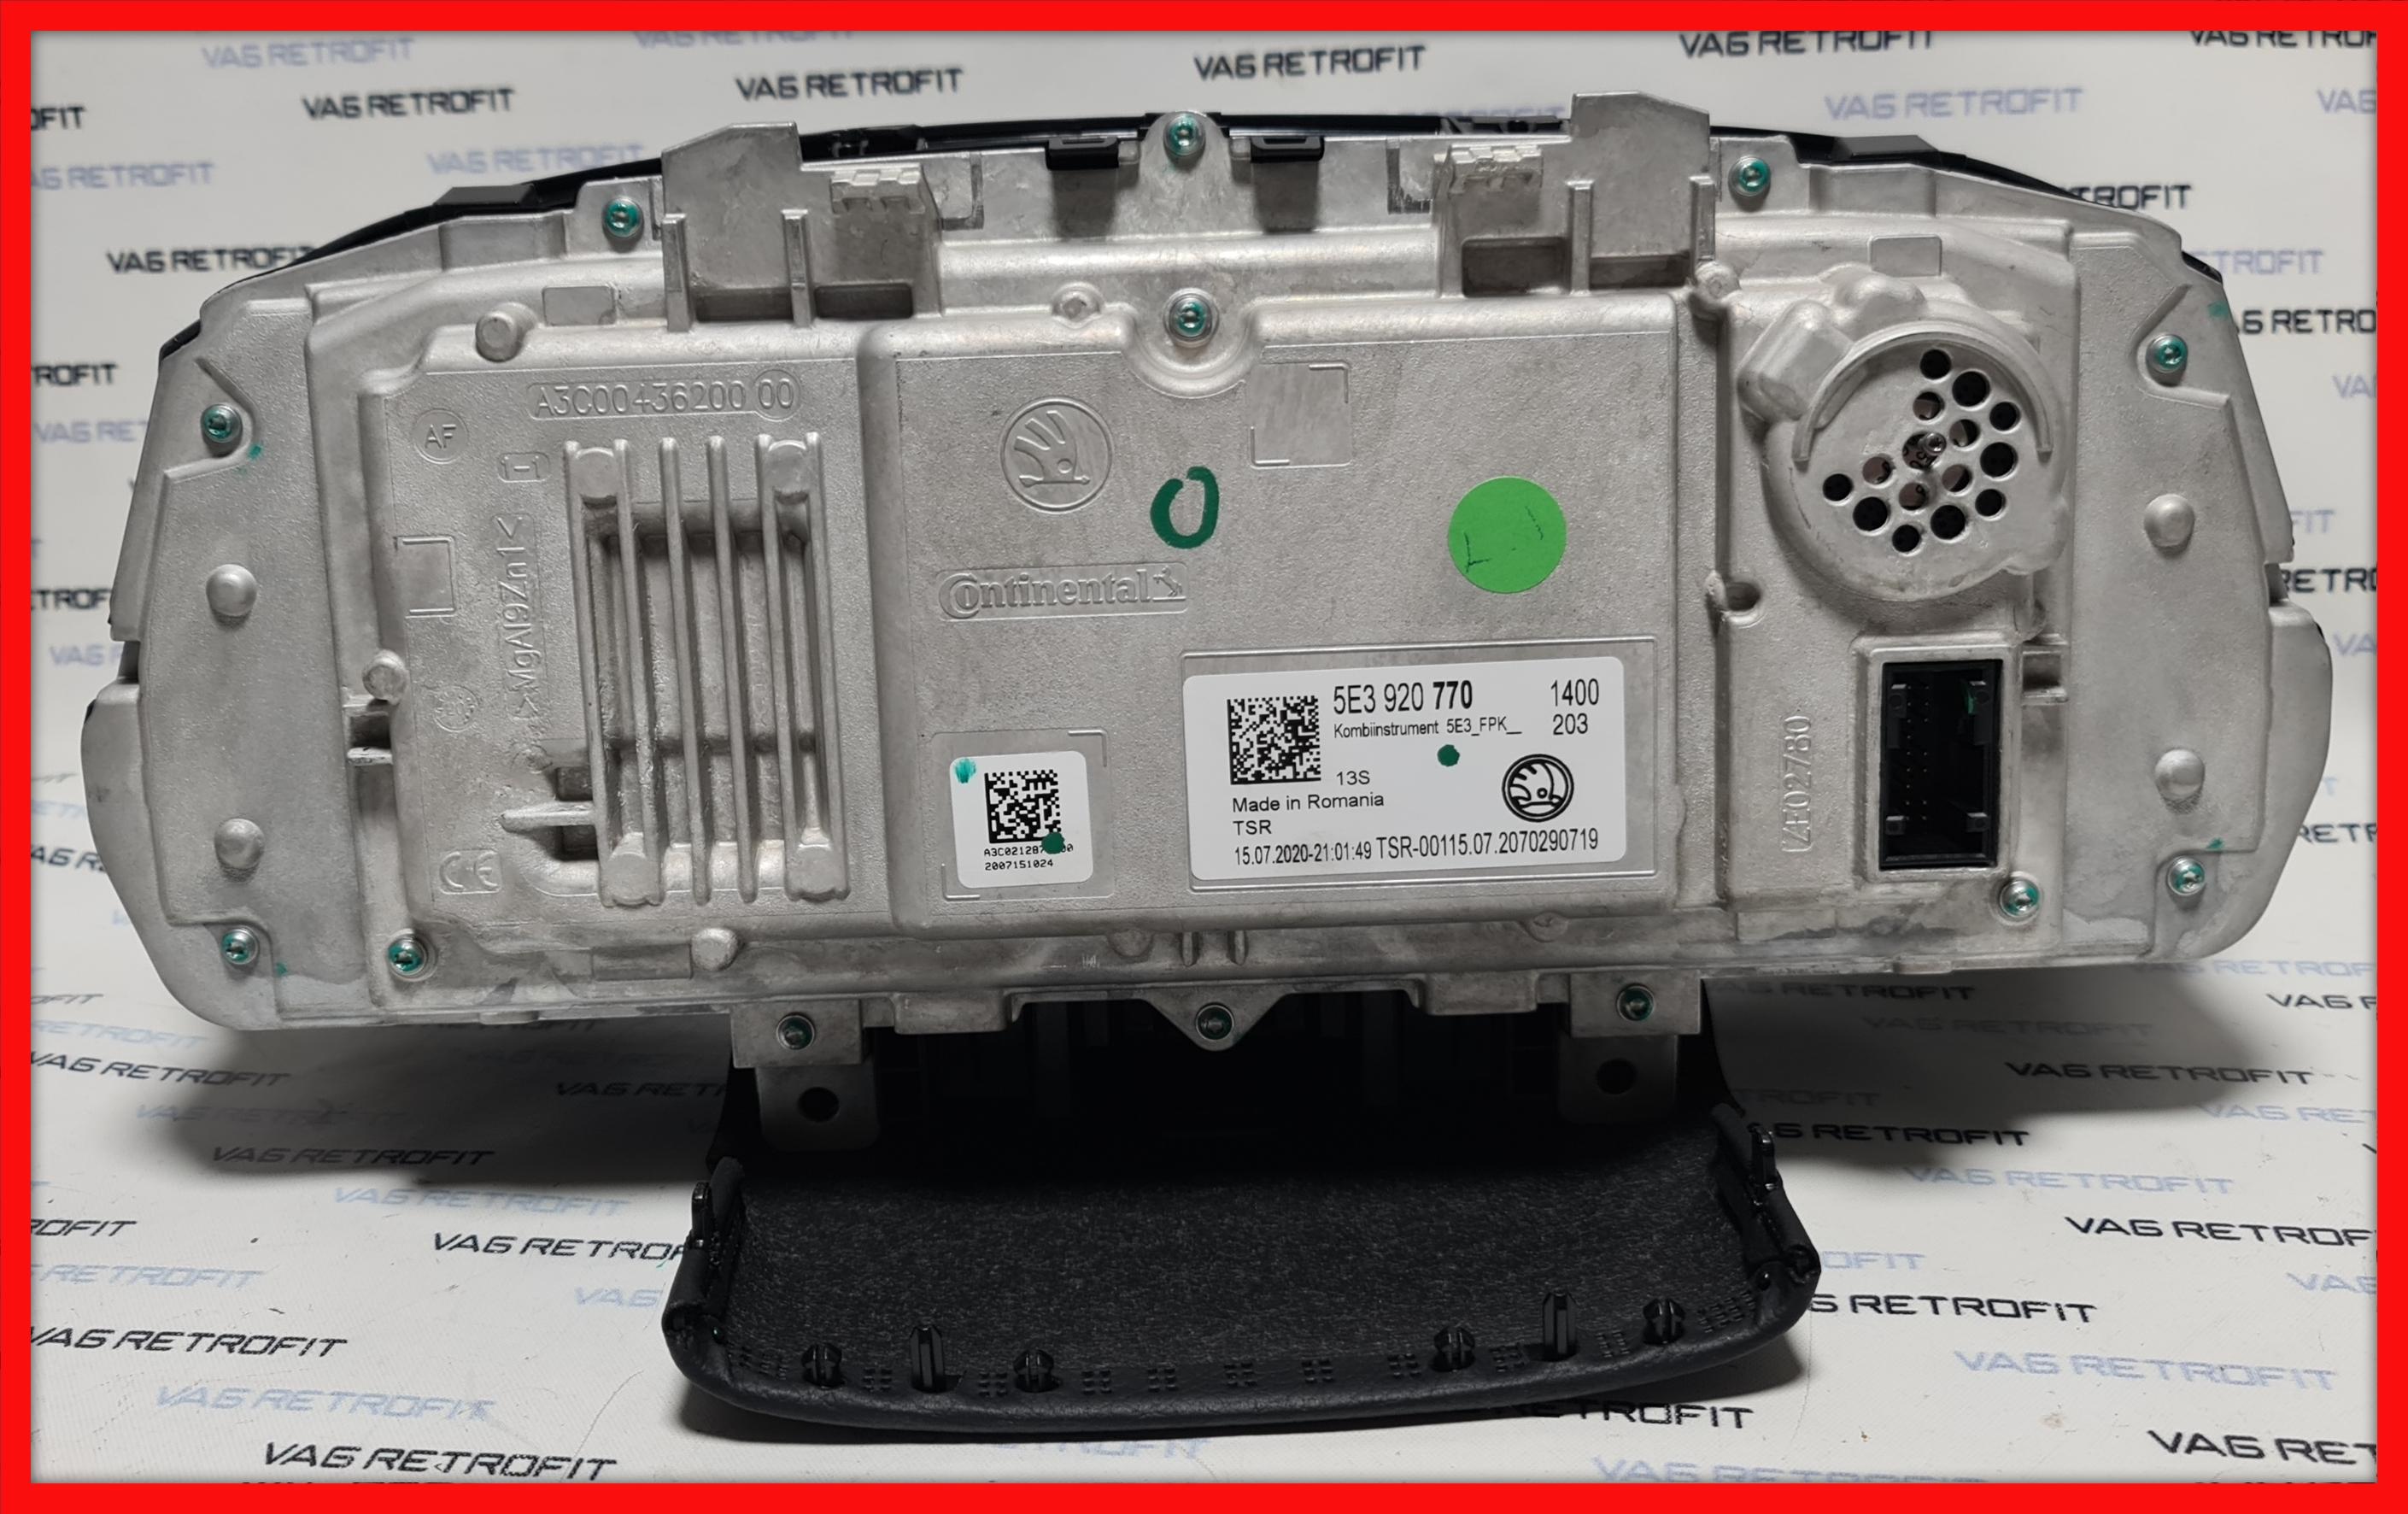 Poza 4 - Ceasuri Digitale Skoda Octavia 4 IV Virtual Cockpit LED Ceasuri Bord